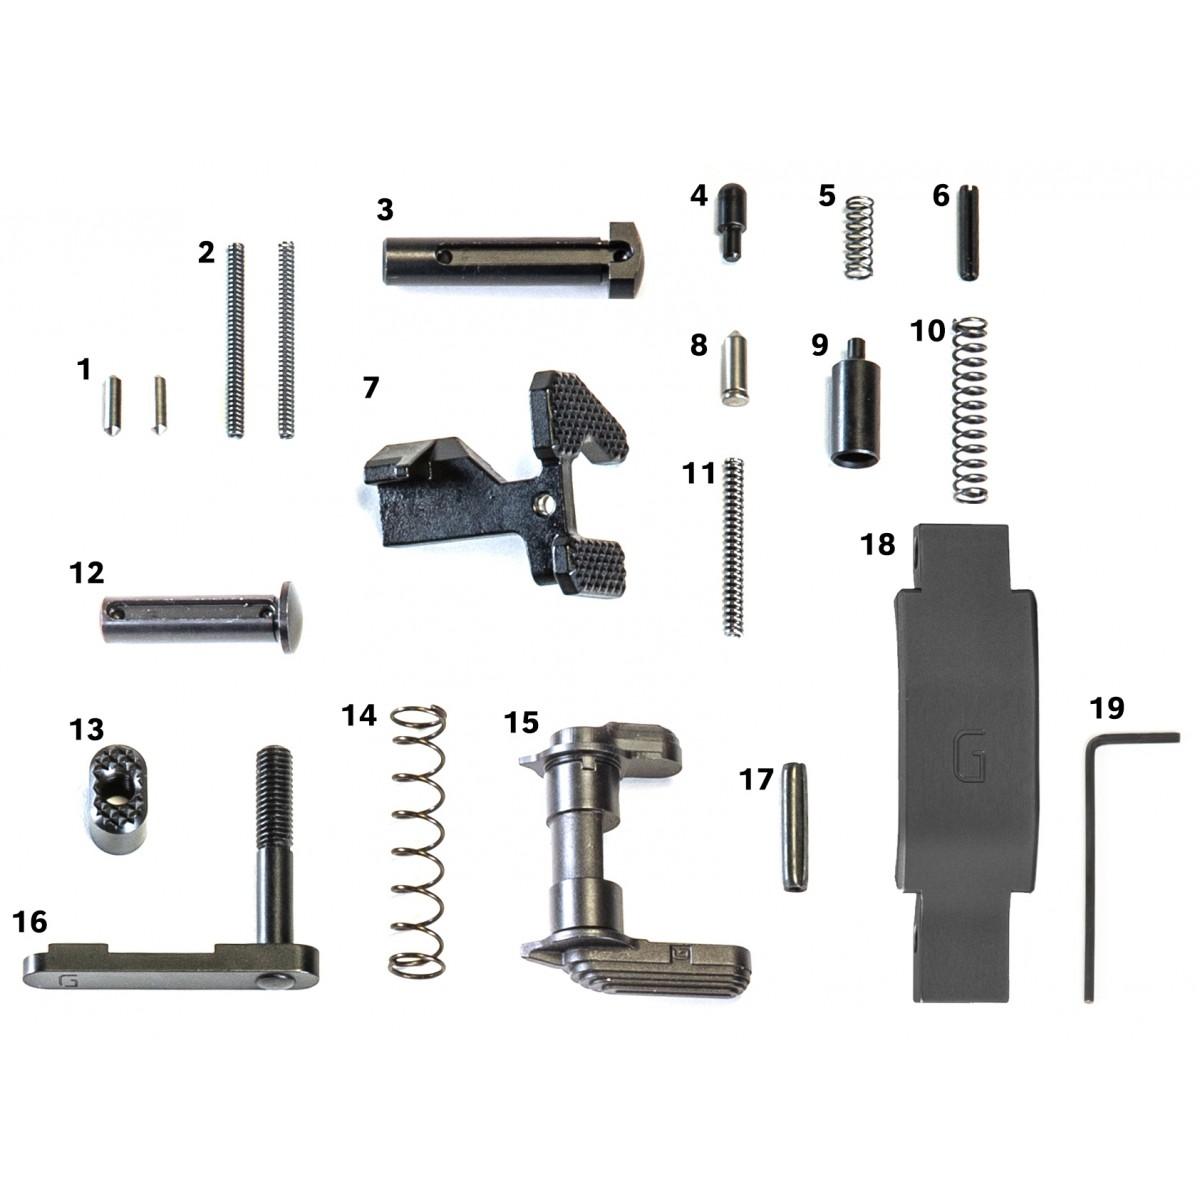 enhanced-lower-parts-kit-no-grip-black-4.jpg